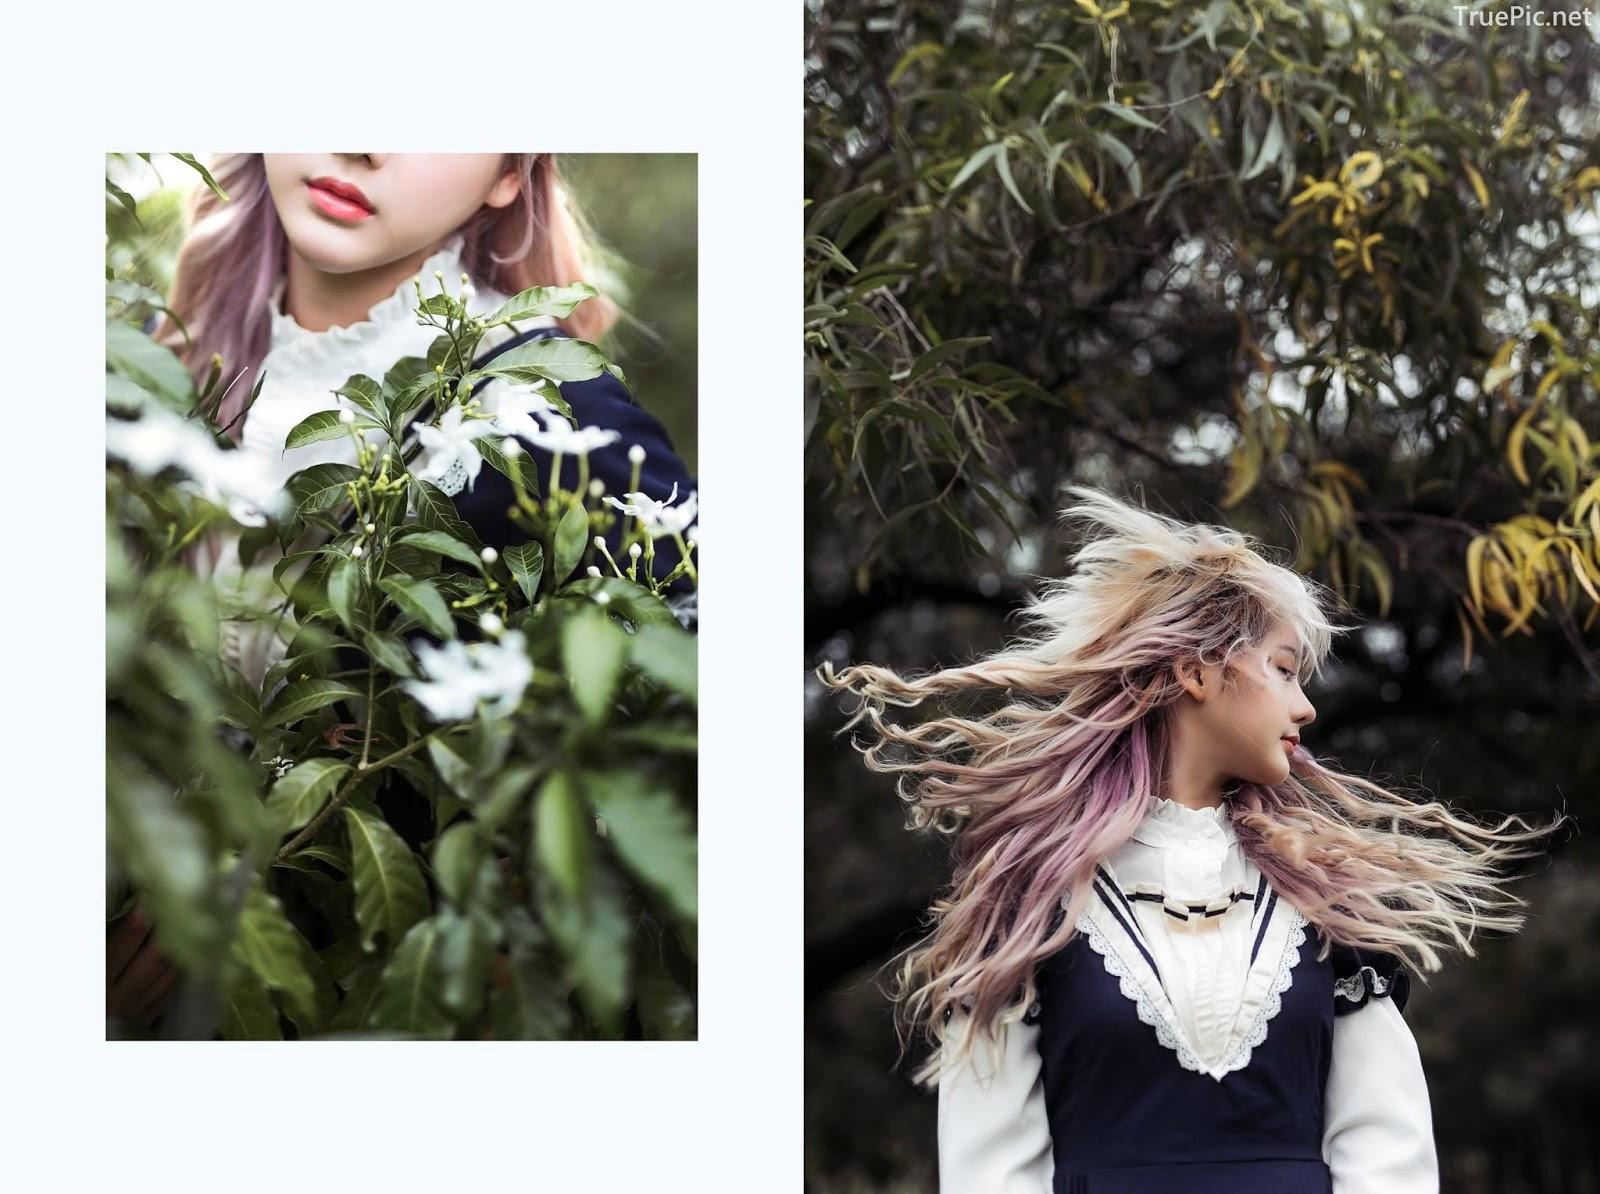 Thailand model - บวรรัตน์ มณีรัตน์ (Nia) - Lost in wonderland - Picture 5